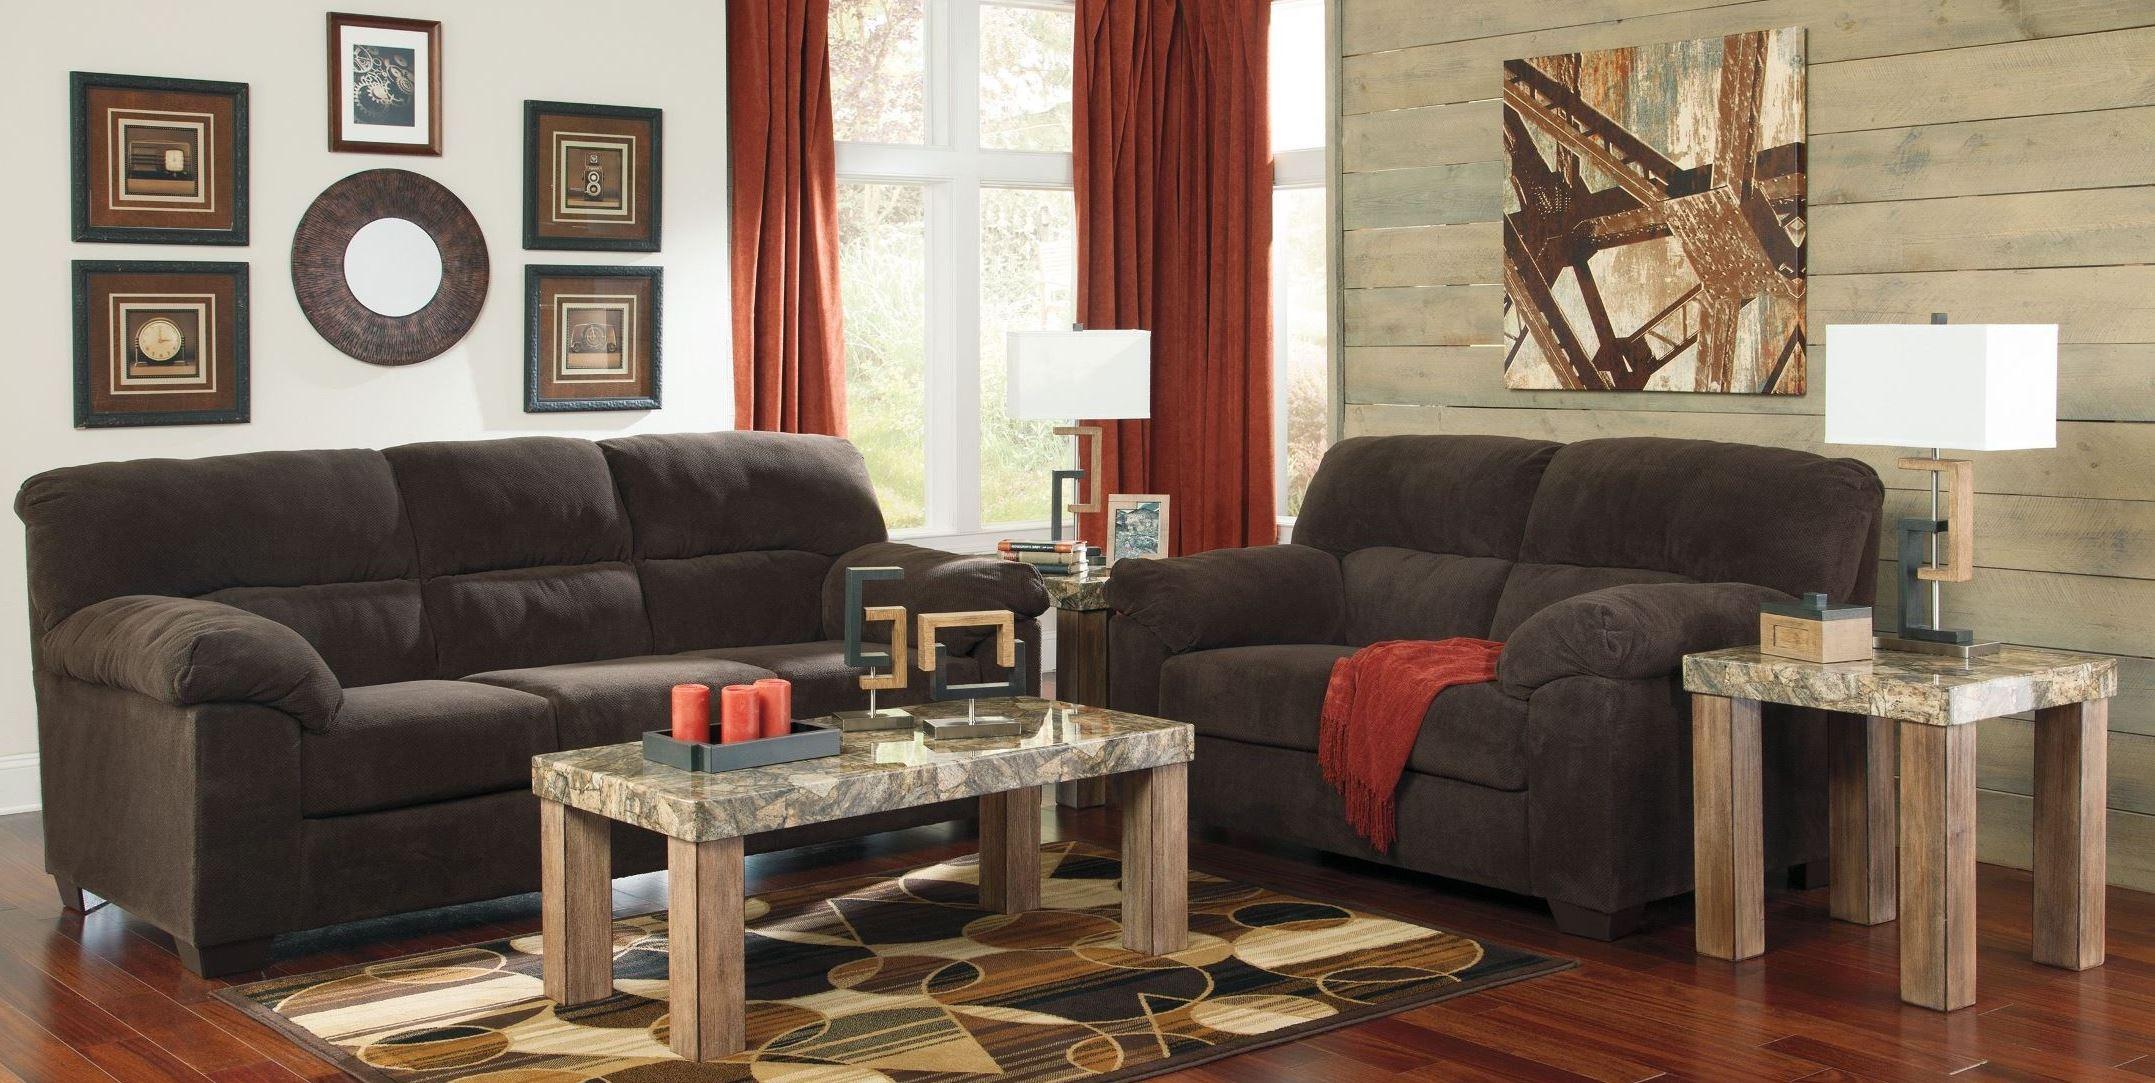 zorah chocolate living room set from ashley 9450138 coleman